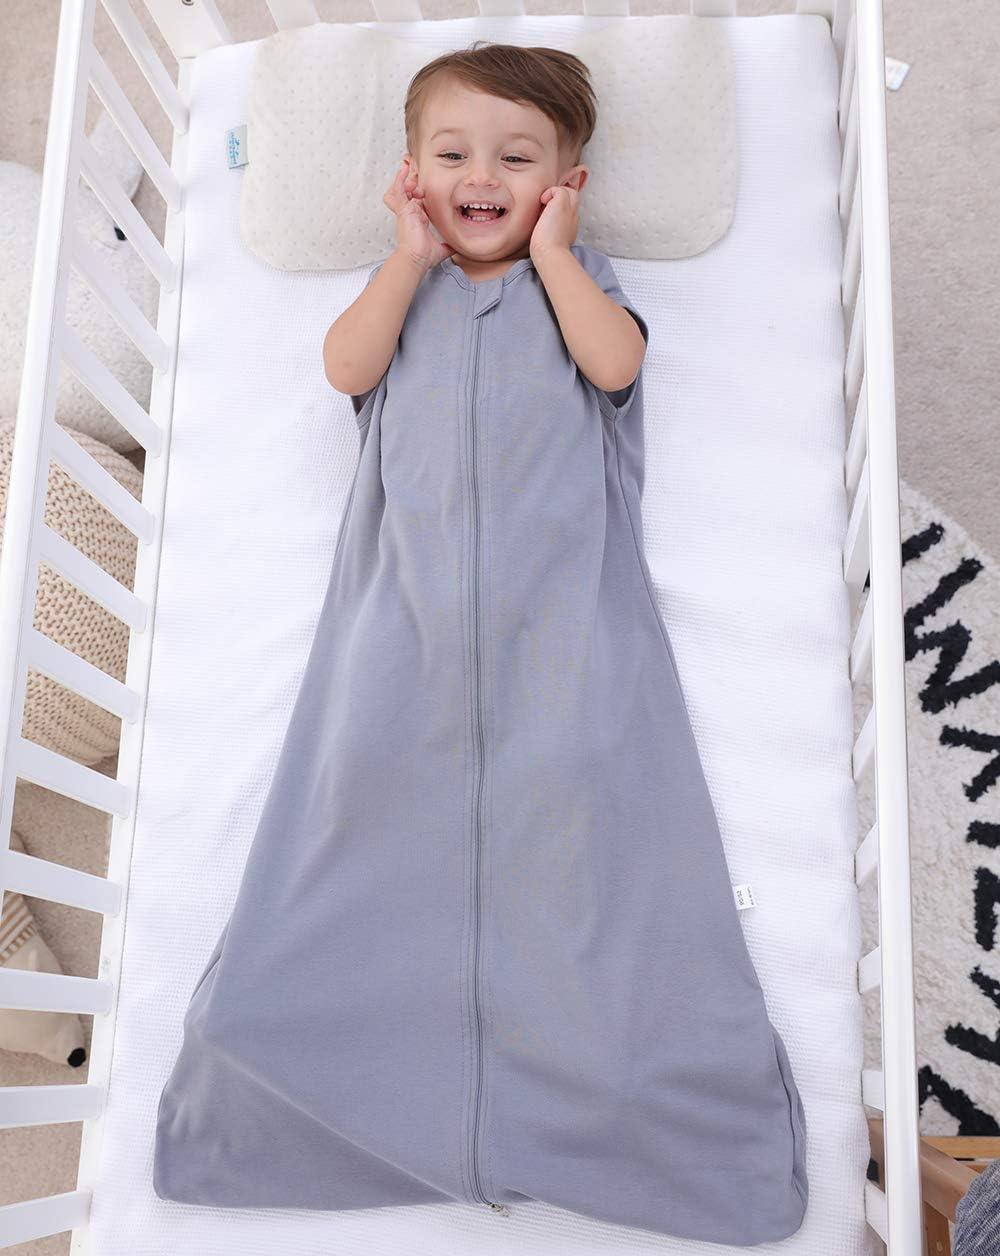 12-36 monate 0,5 tog azul Jirafa azul Talla:110CM Saco de dormir para beb/é de verano para ni/ña primavera pijama de algod/ón fino con b/úho verde